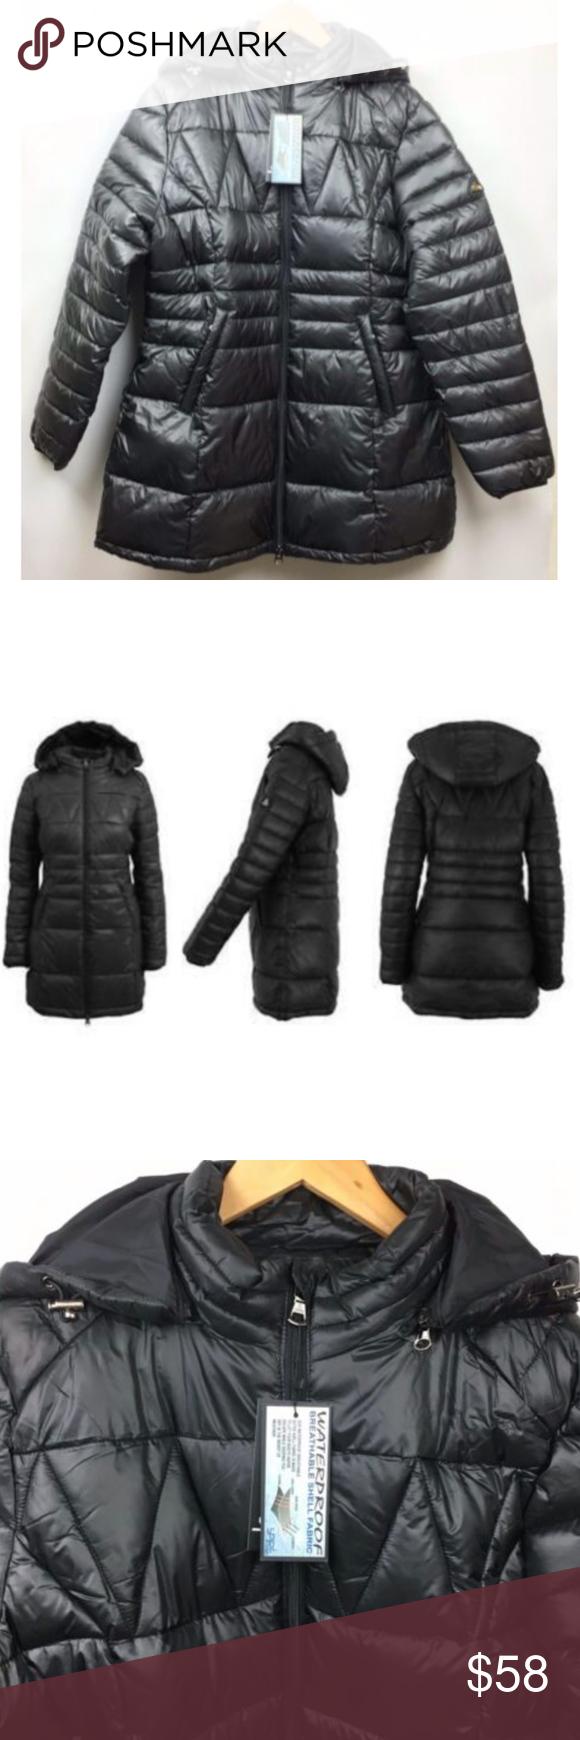 New Spire Black Puffer Coat 3xl Black Puffer Coat Puffer Coat Puffer [ 1740 x 580 Pixel ]